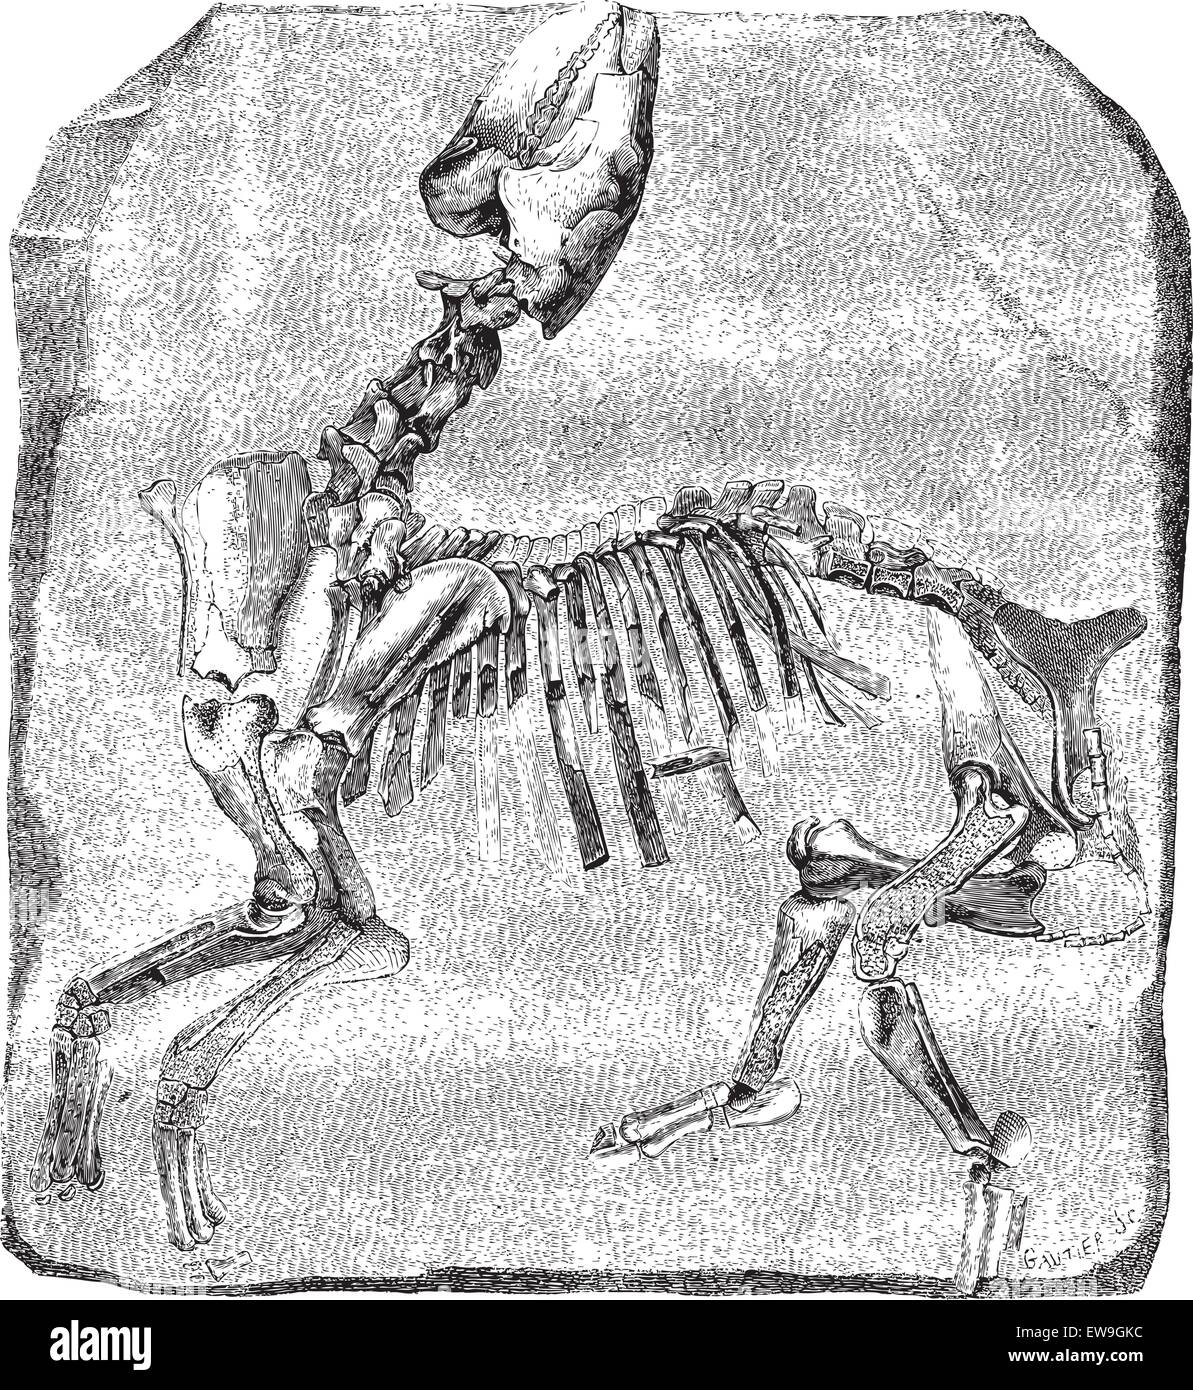 Comparative Anatomy Stockfotos & Comparative Anatomy Bilder - Alamy